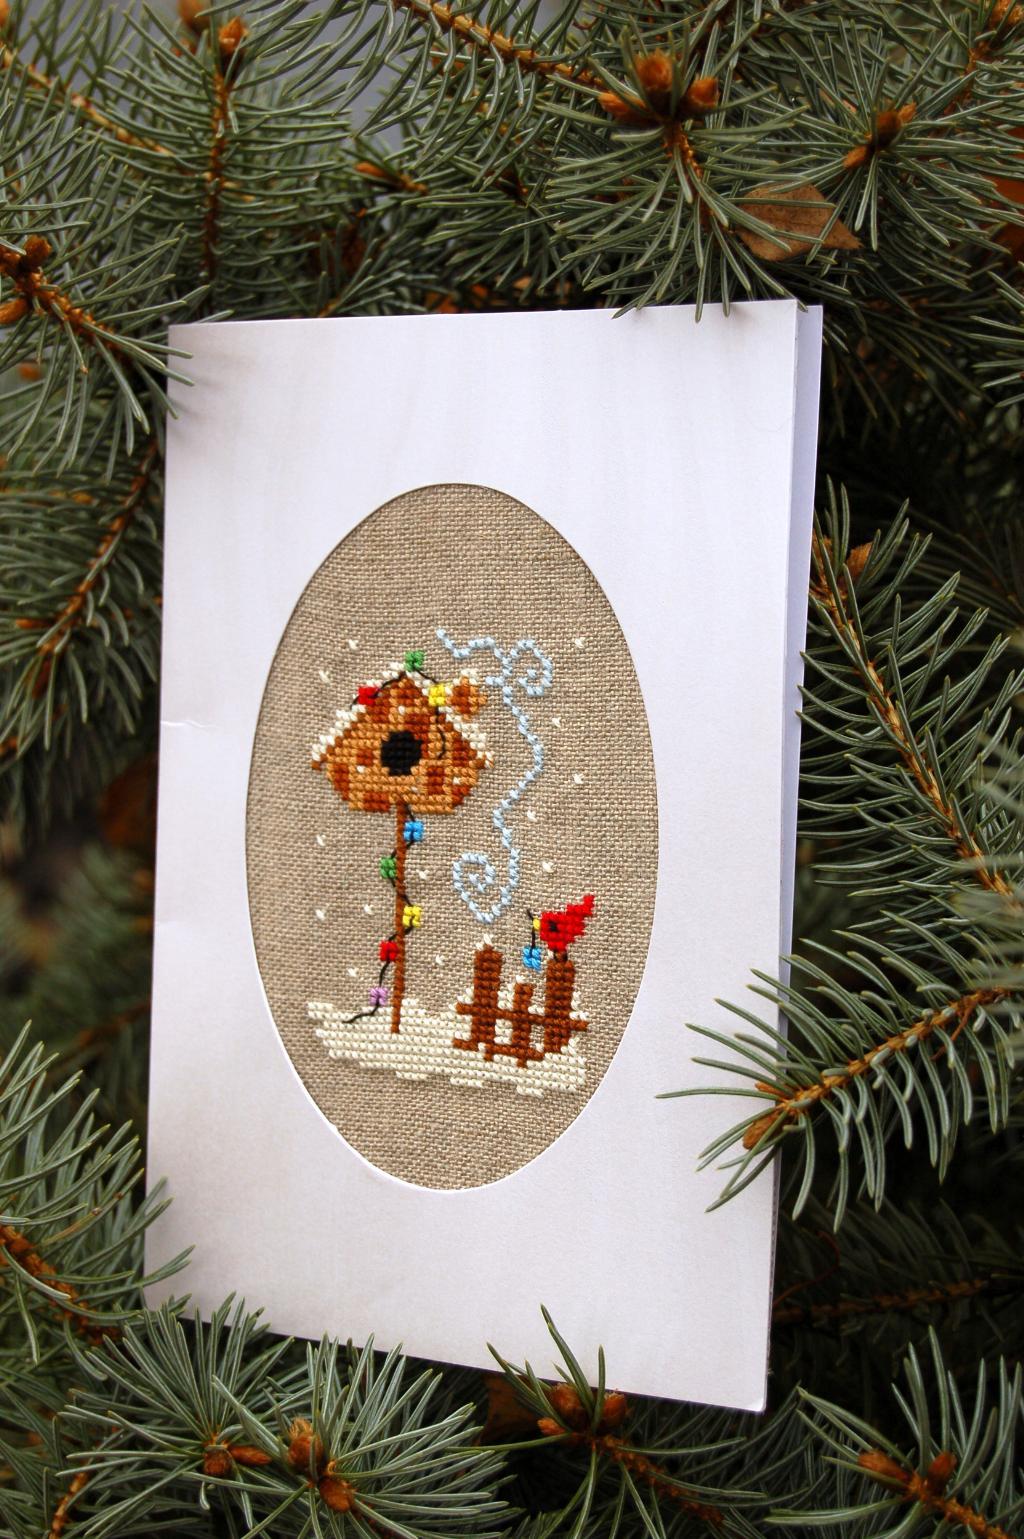 25 - Катенька. 2012 Проект Зимняя открытка